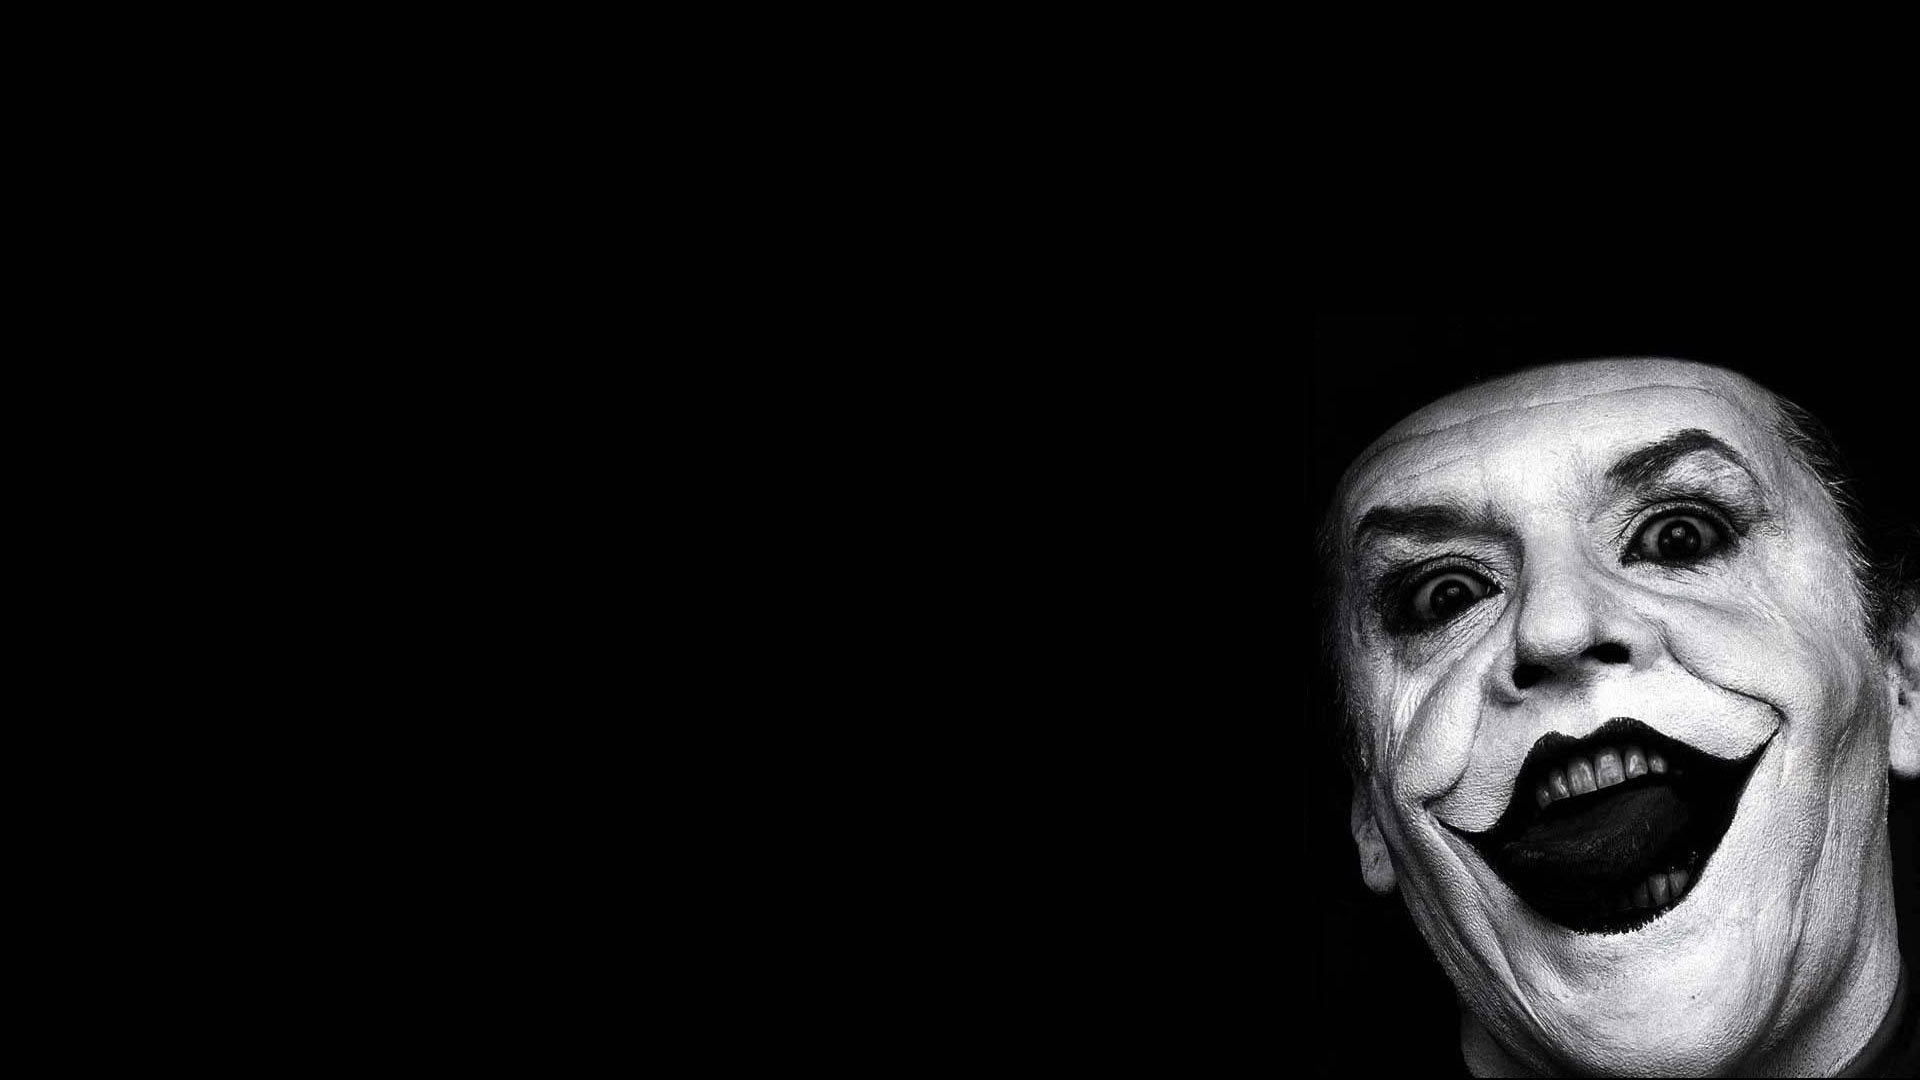 The Joker Laughs Wallpapers 1920x1080